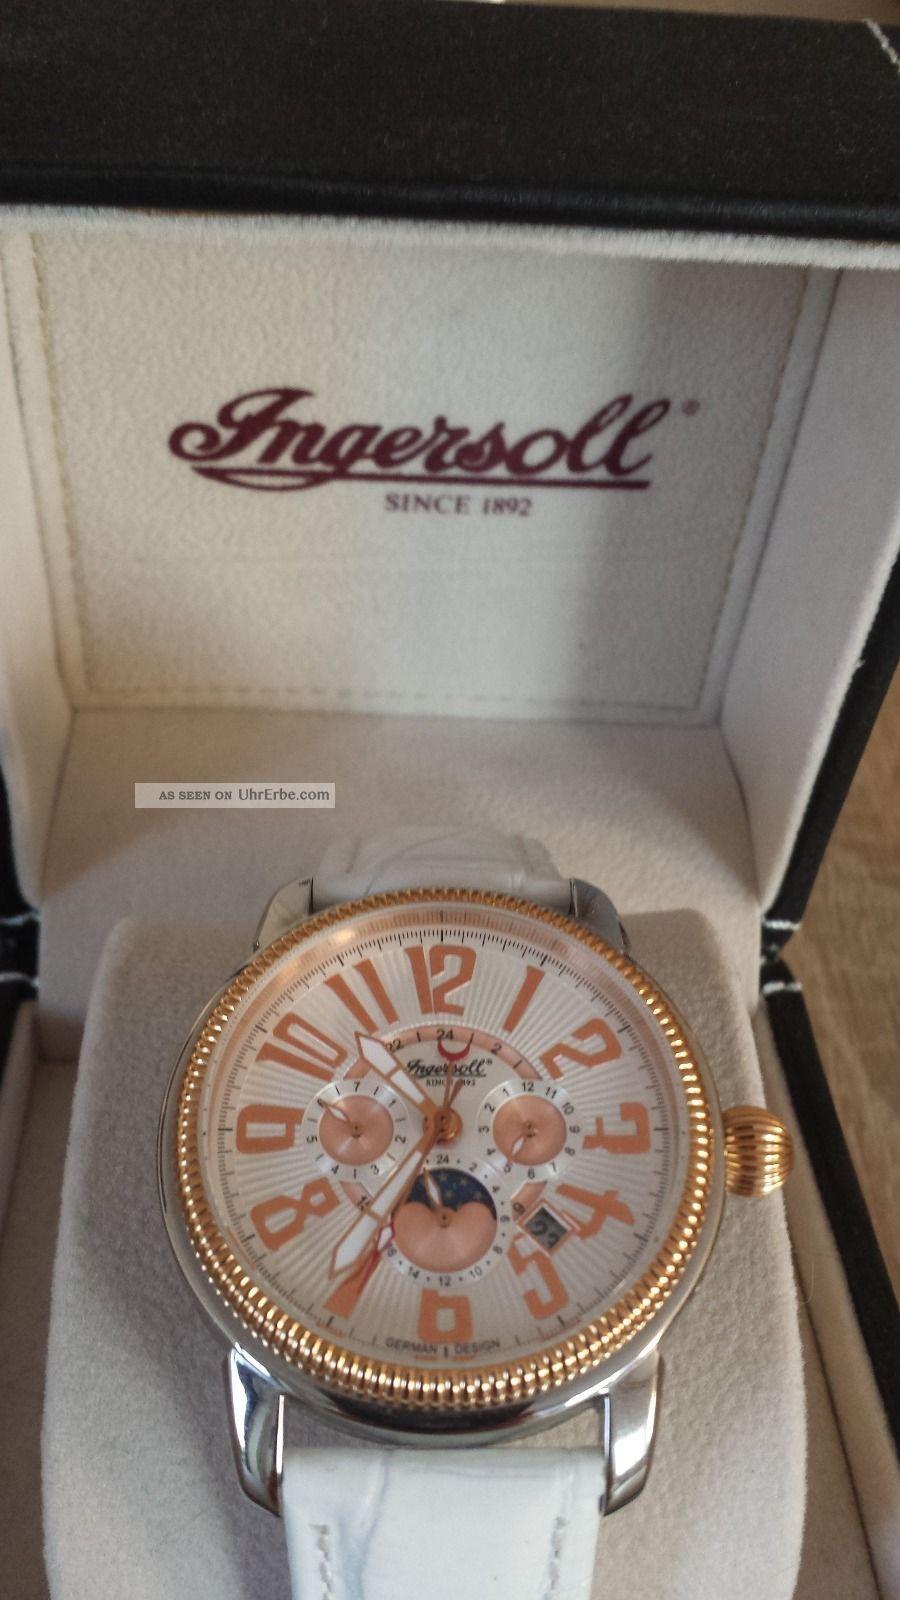 Hochwertige Ingersoll Automatik Damen Armbanduhr Modell Sumter Armbanduhren Bild